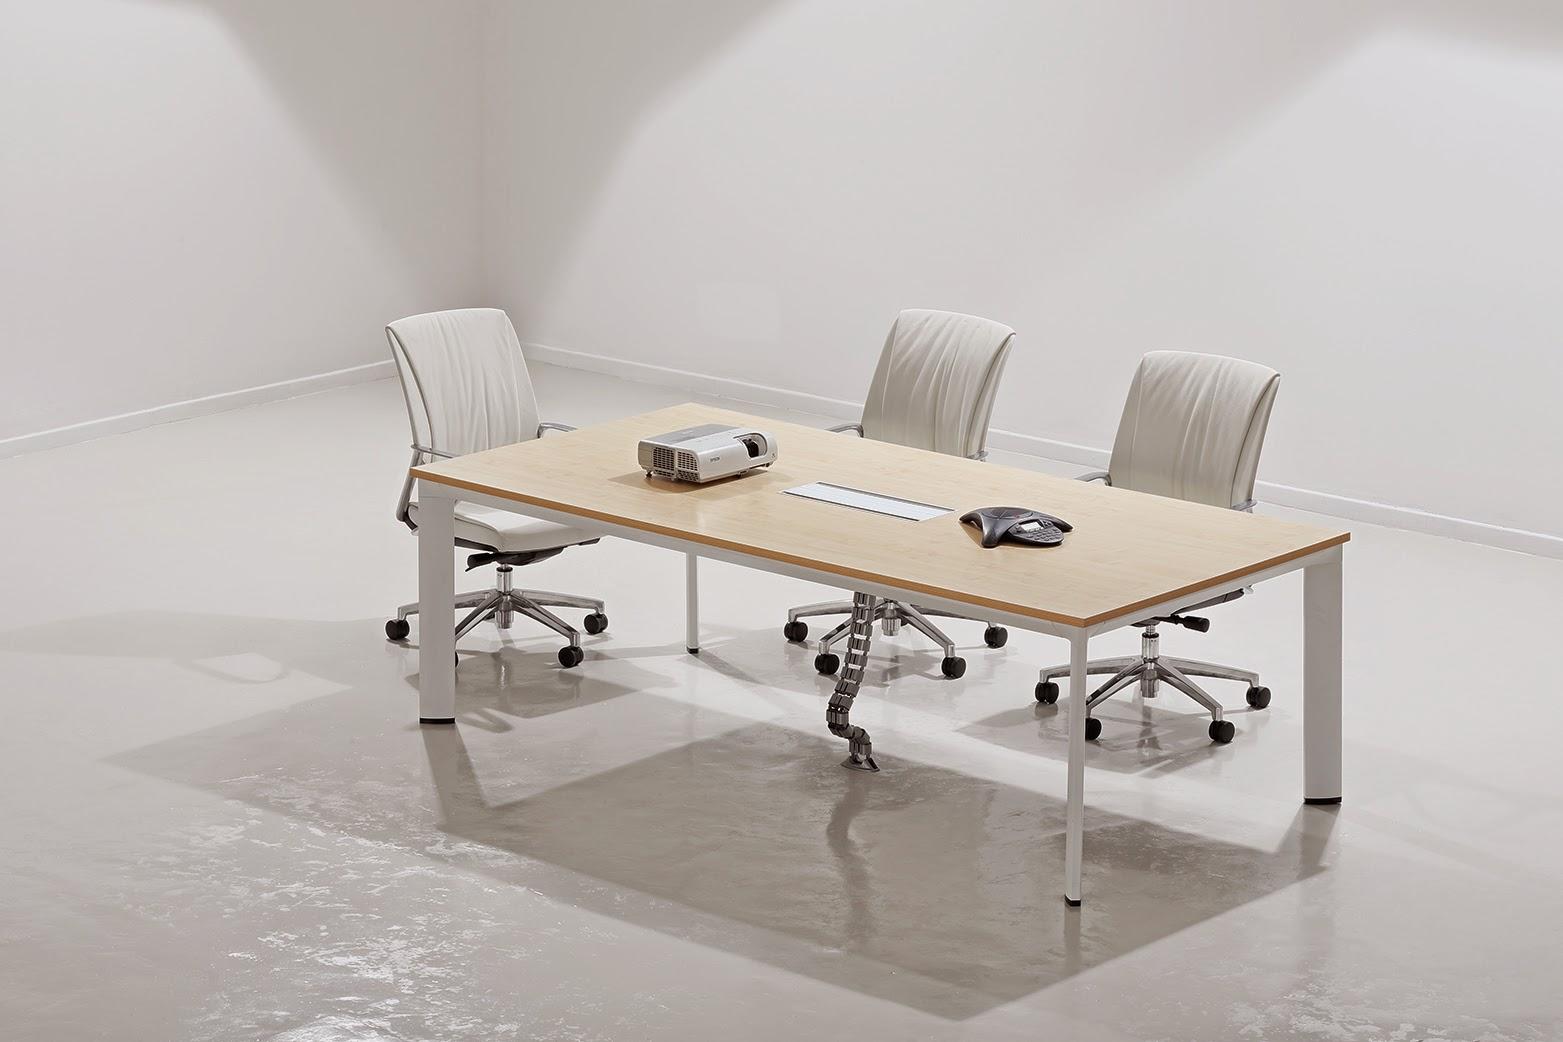 Modular Furniture Featherlite Office Systems Featherlite